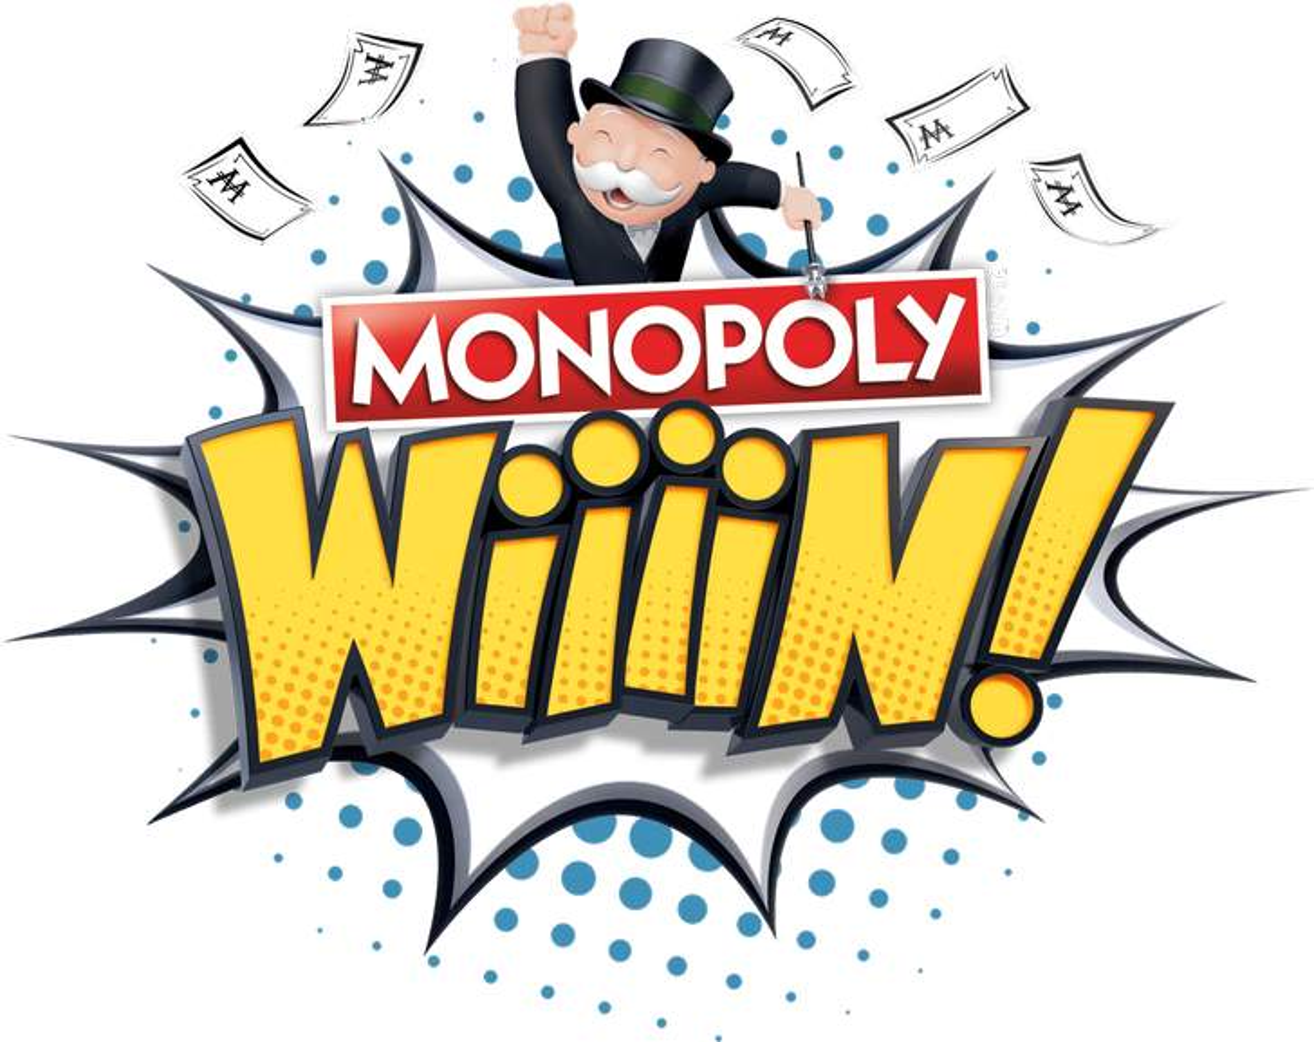 Mcdonalds monopoly 2018 prizes snapfish